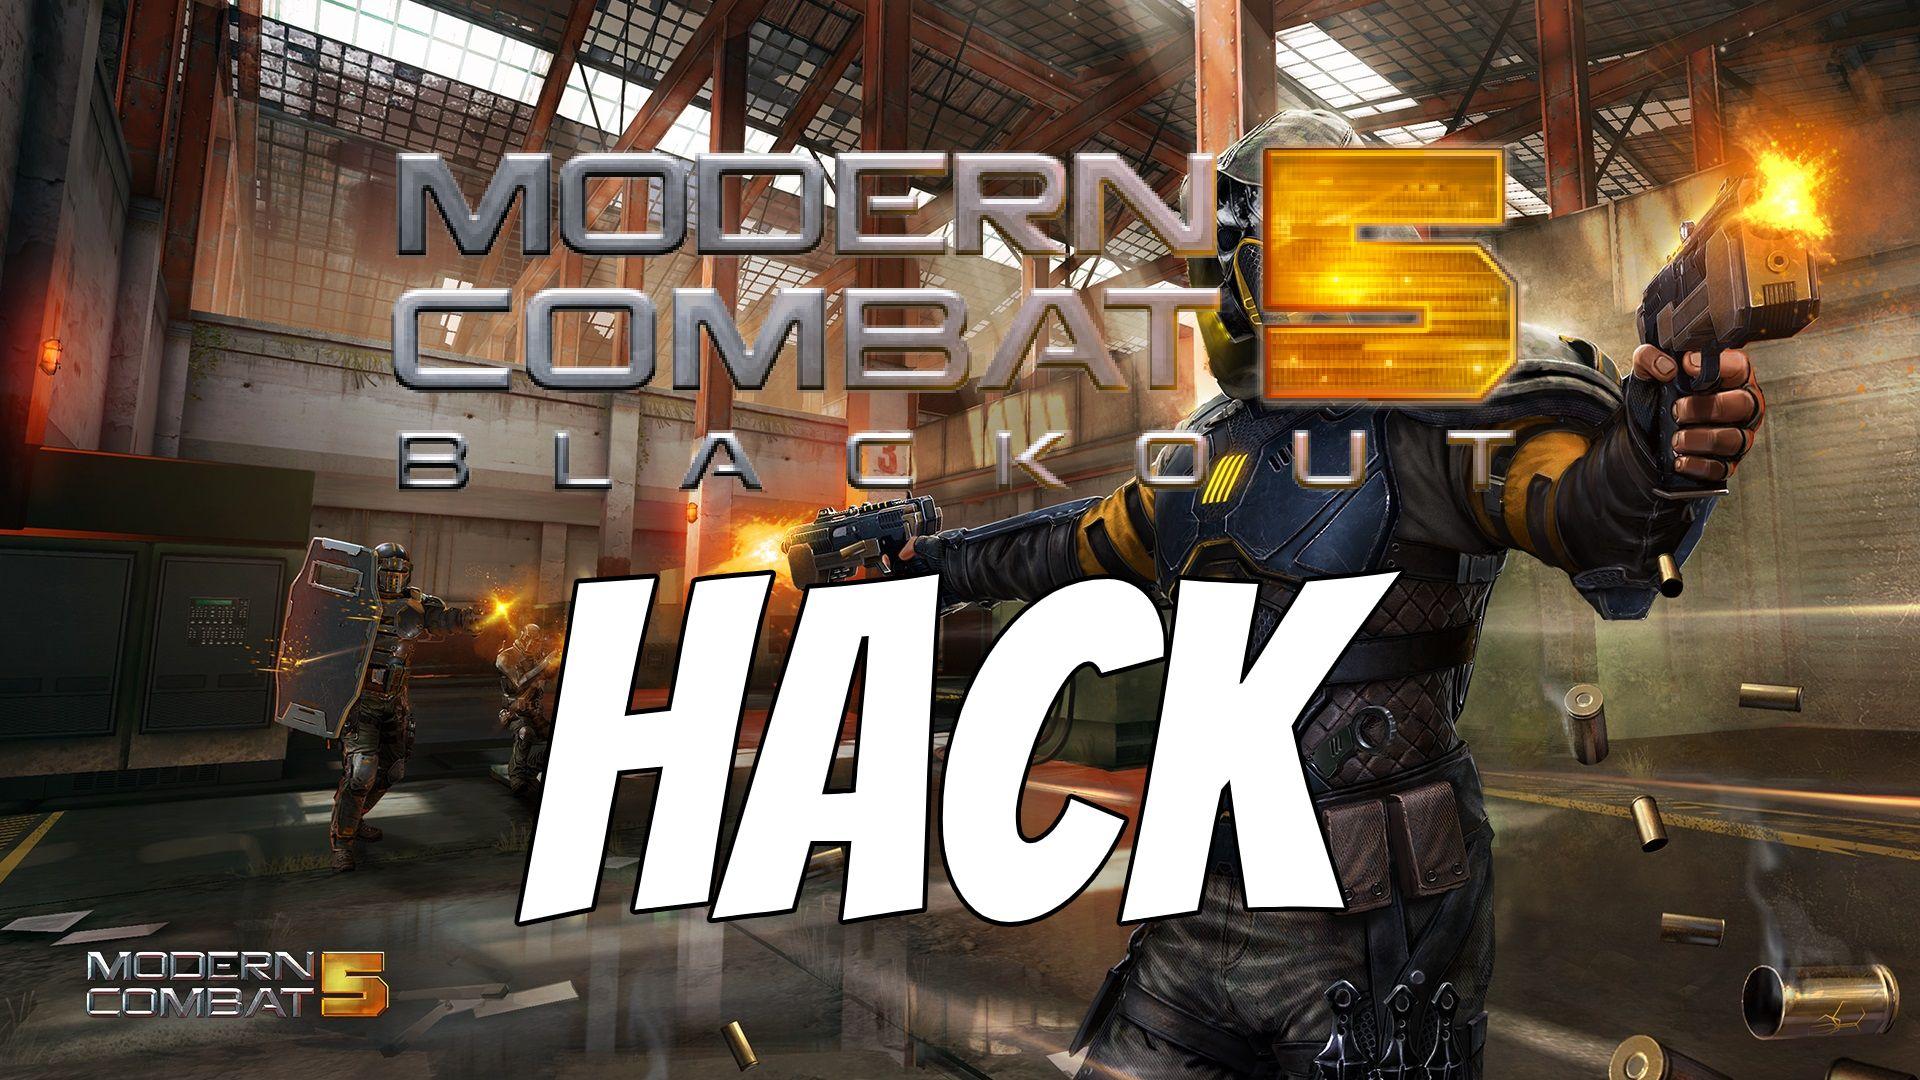 Modern Combat 5 Hack Unlimited Credits Modern Combat 5 Cheats Free Facebook Likes Cute Patterns Wallpaper Website Header Design